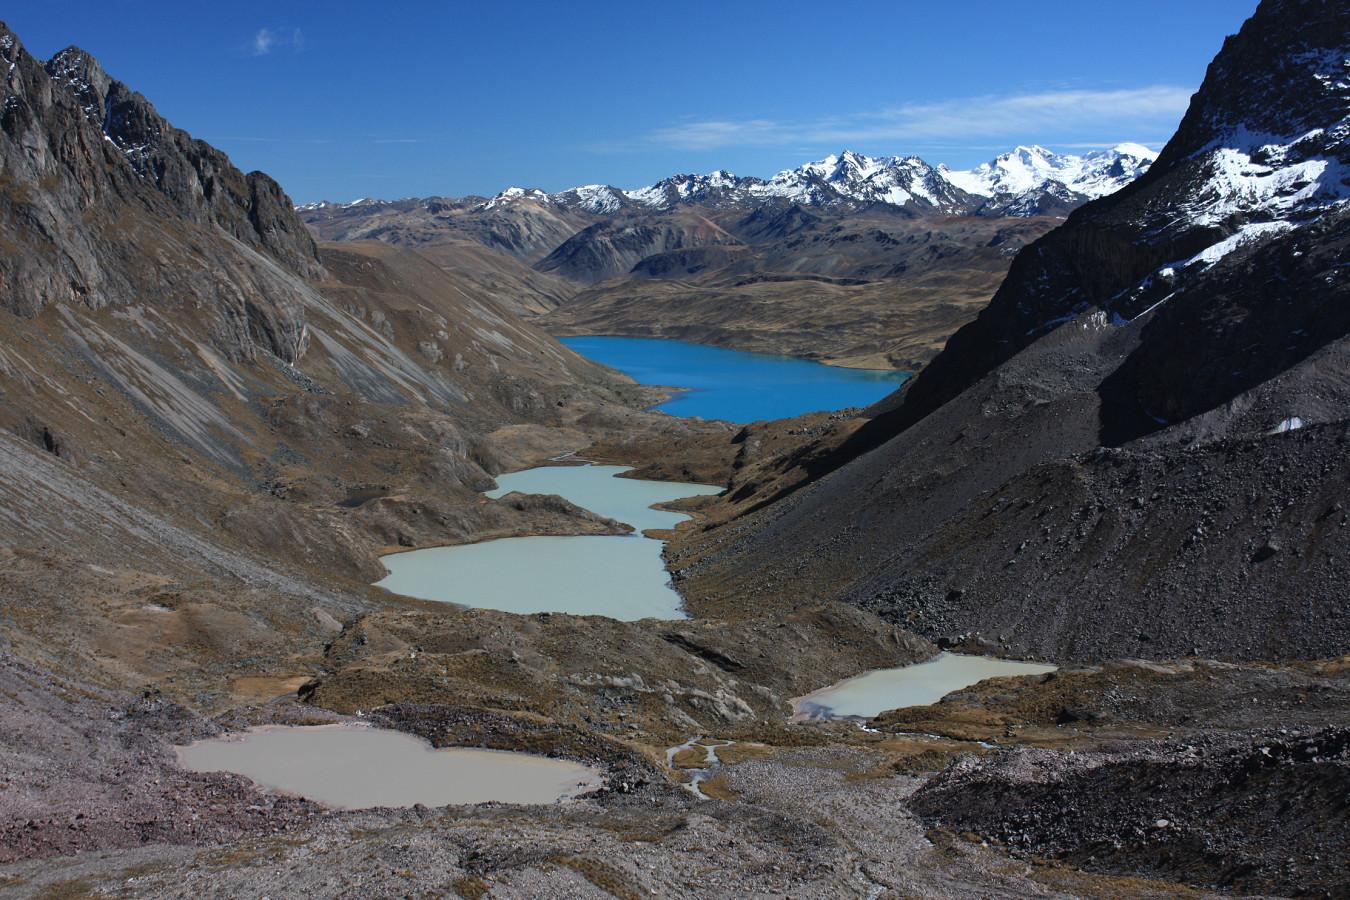 Vallée d'accès au Chumpe (Cordillera Vilcanota)